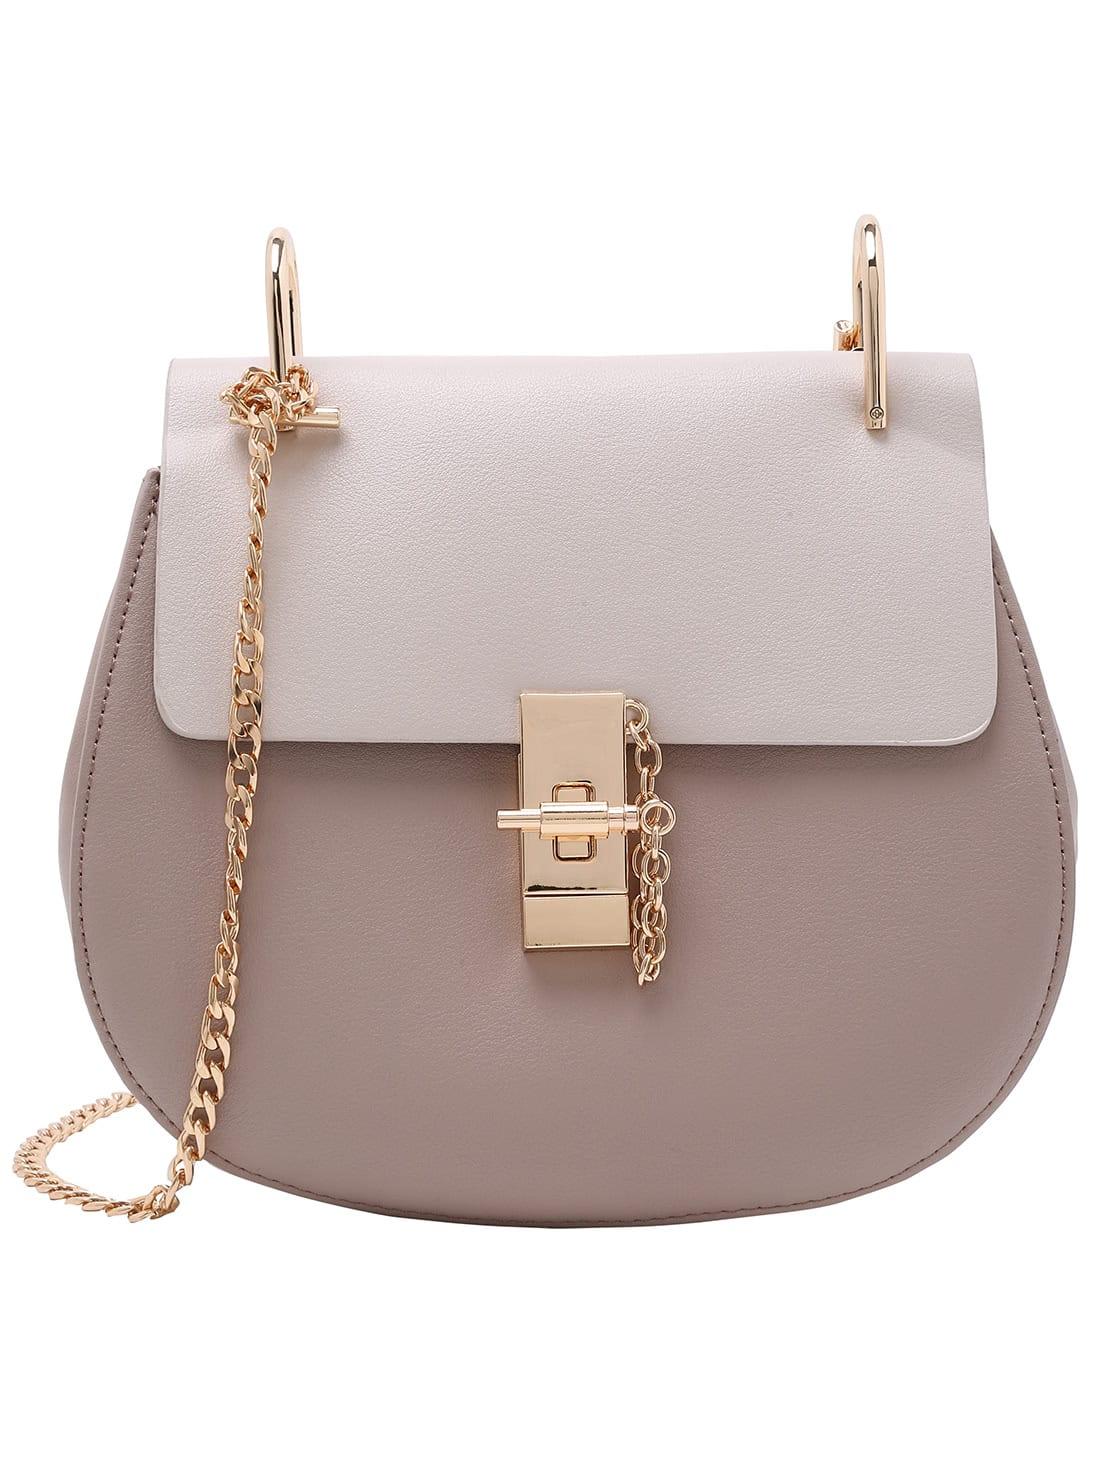 Фото Contrast Faux Leather Chain Saddle Bag - Grey. Купить с доставкой